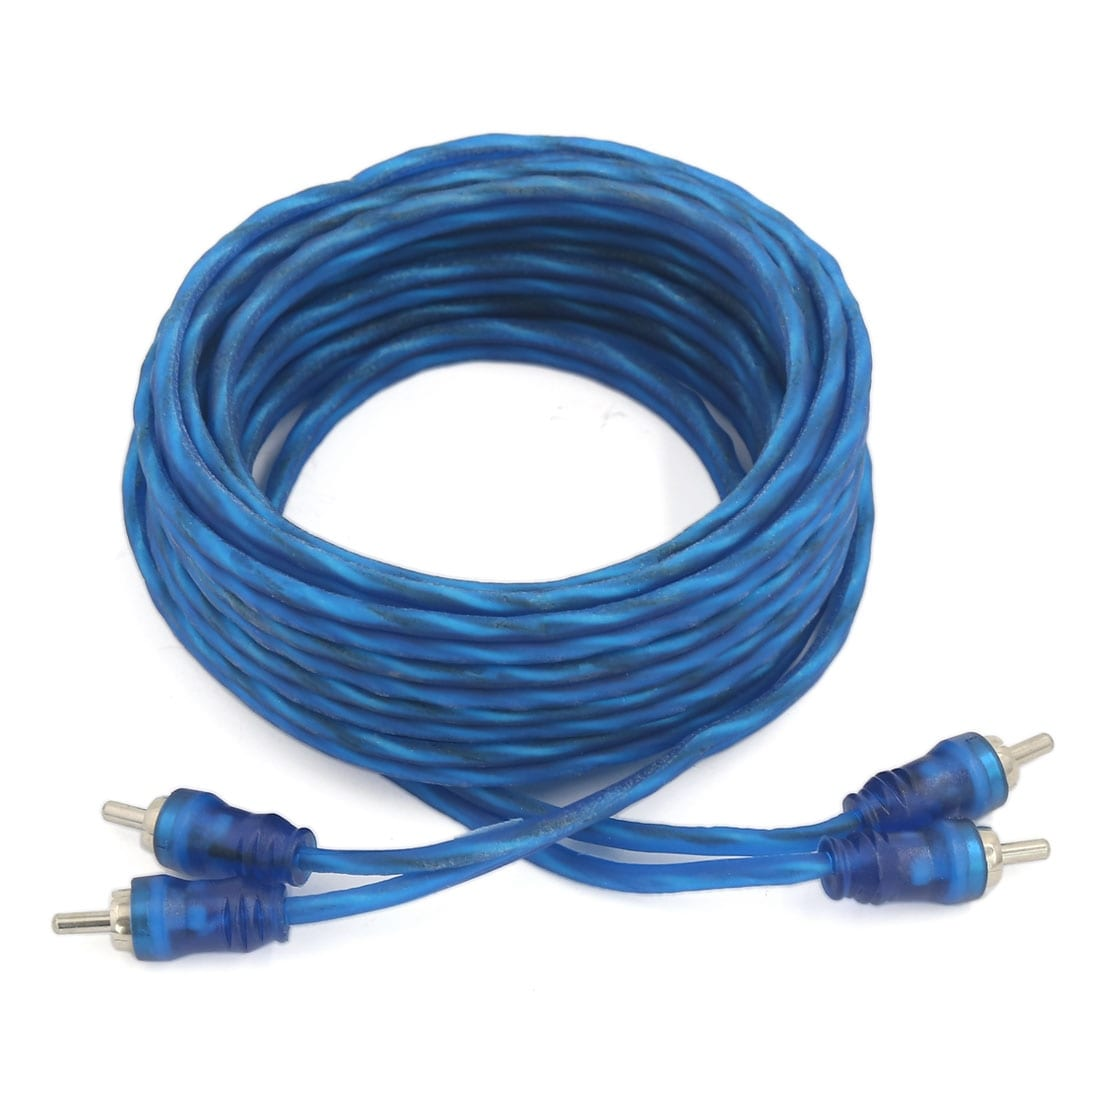 Unique Bargains 4.5M 2 RCA Audio Video System AV Extension Cable ...